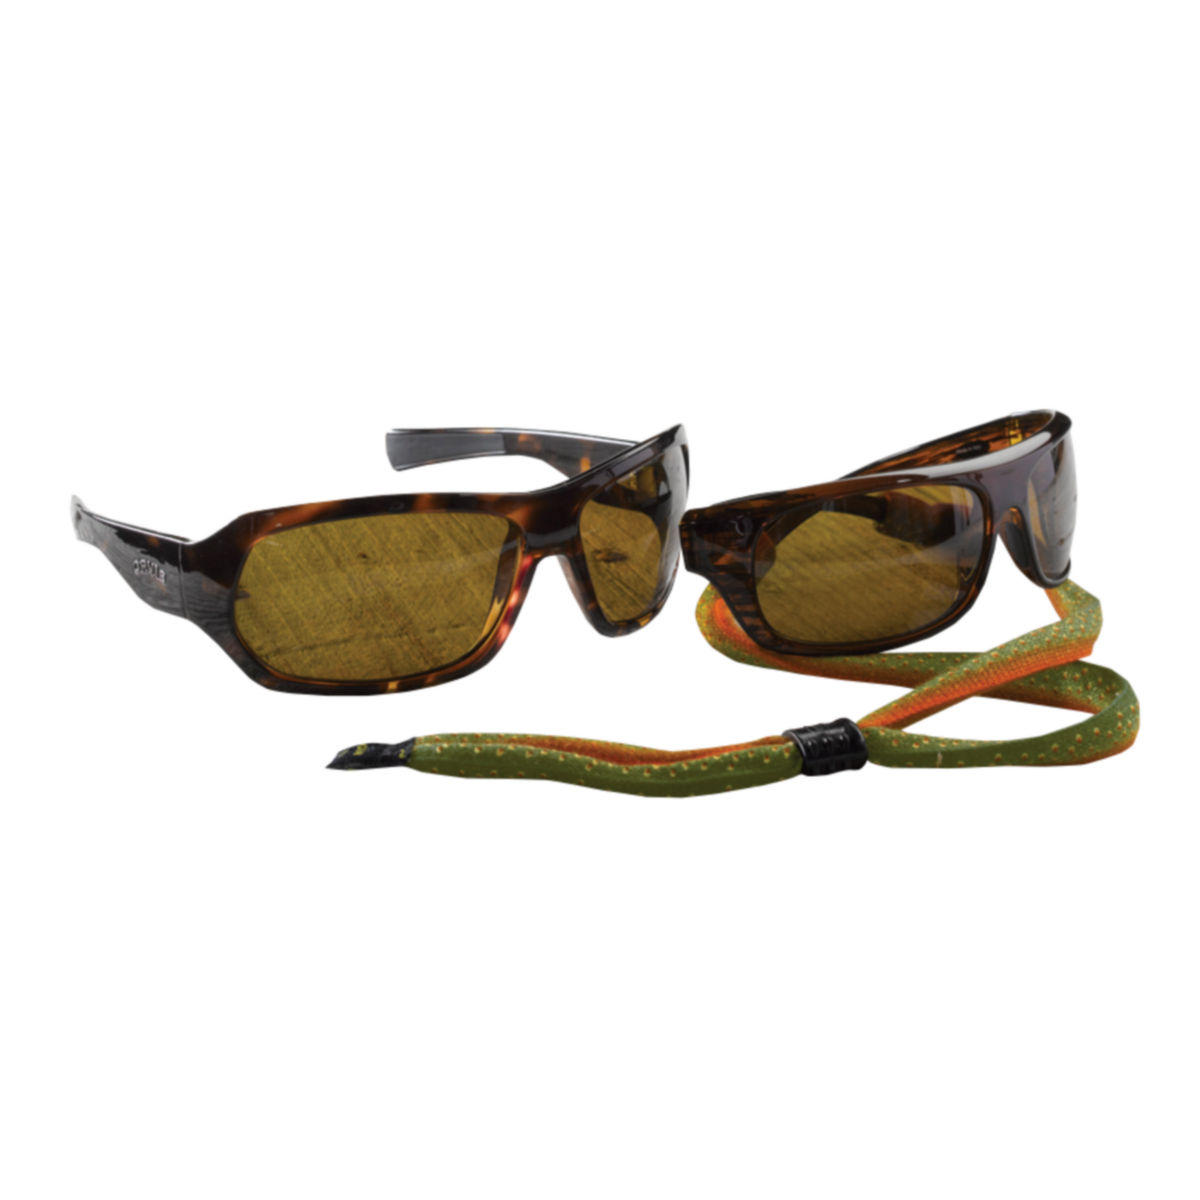 Fishskin Sunglass Lanyard - image number 0